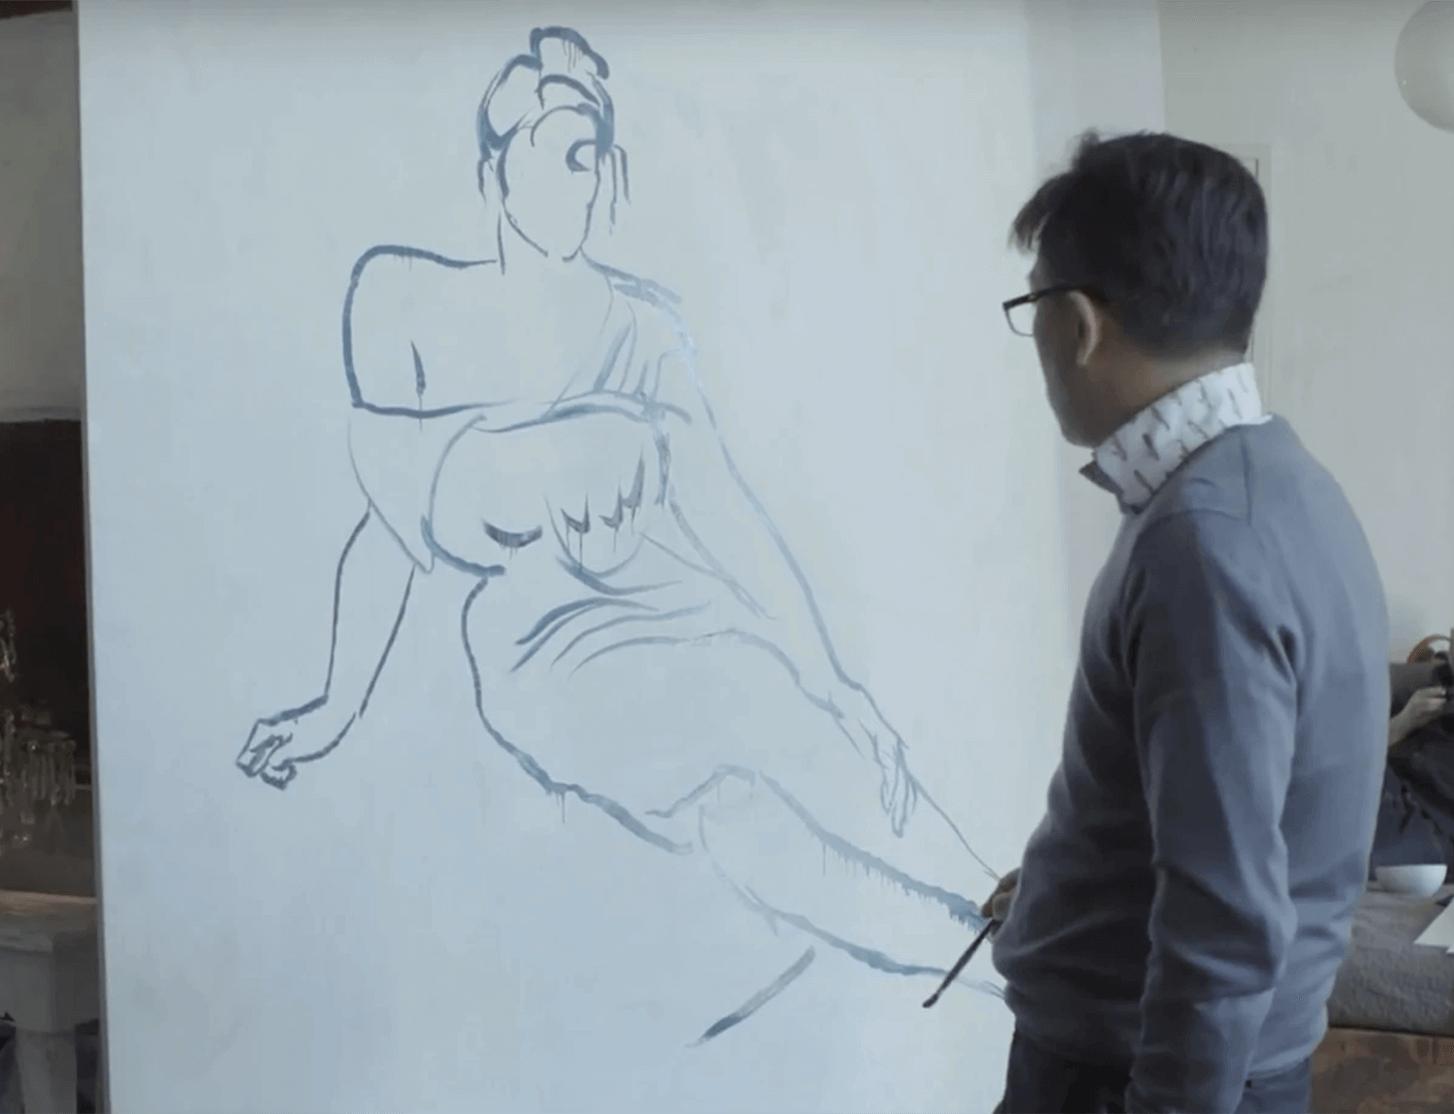 Art Basel Hong Kong's Film programme features three films on the work of Liu Xiaodong